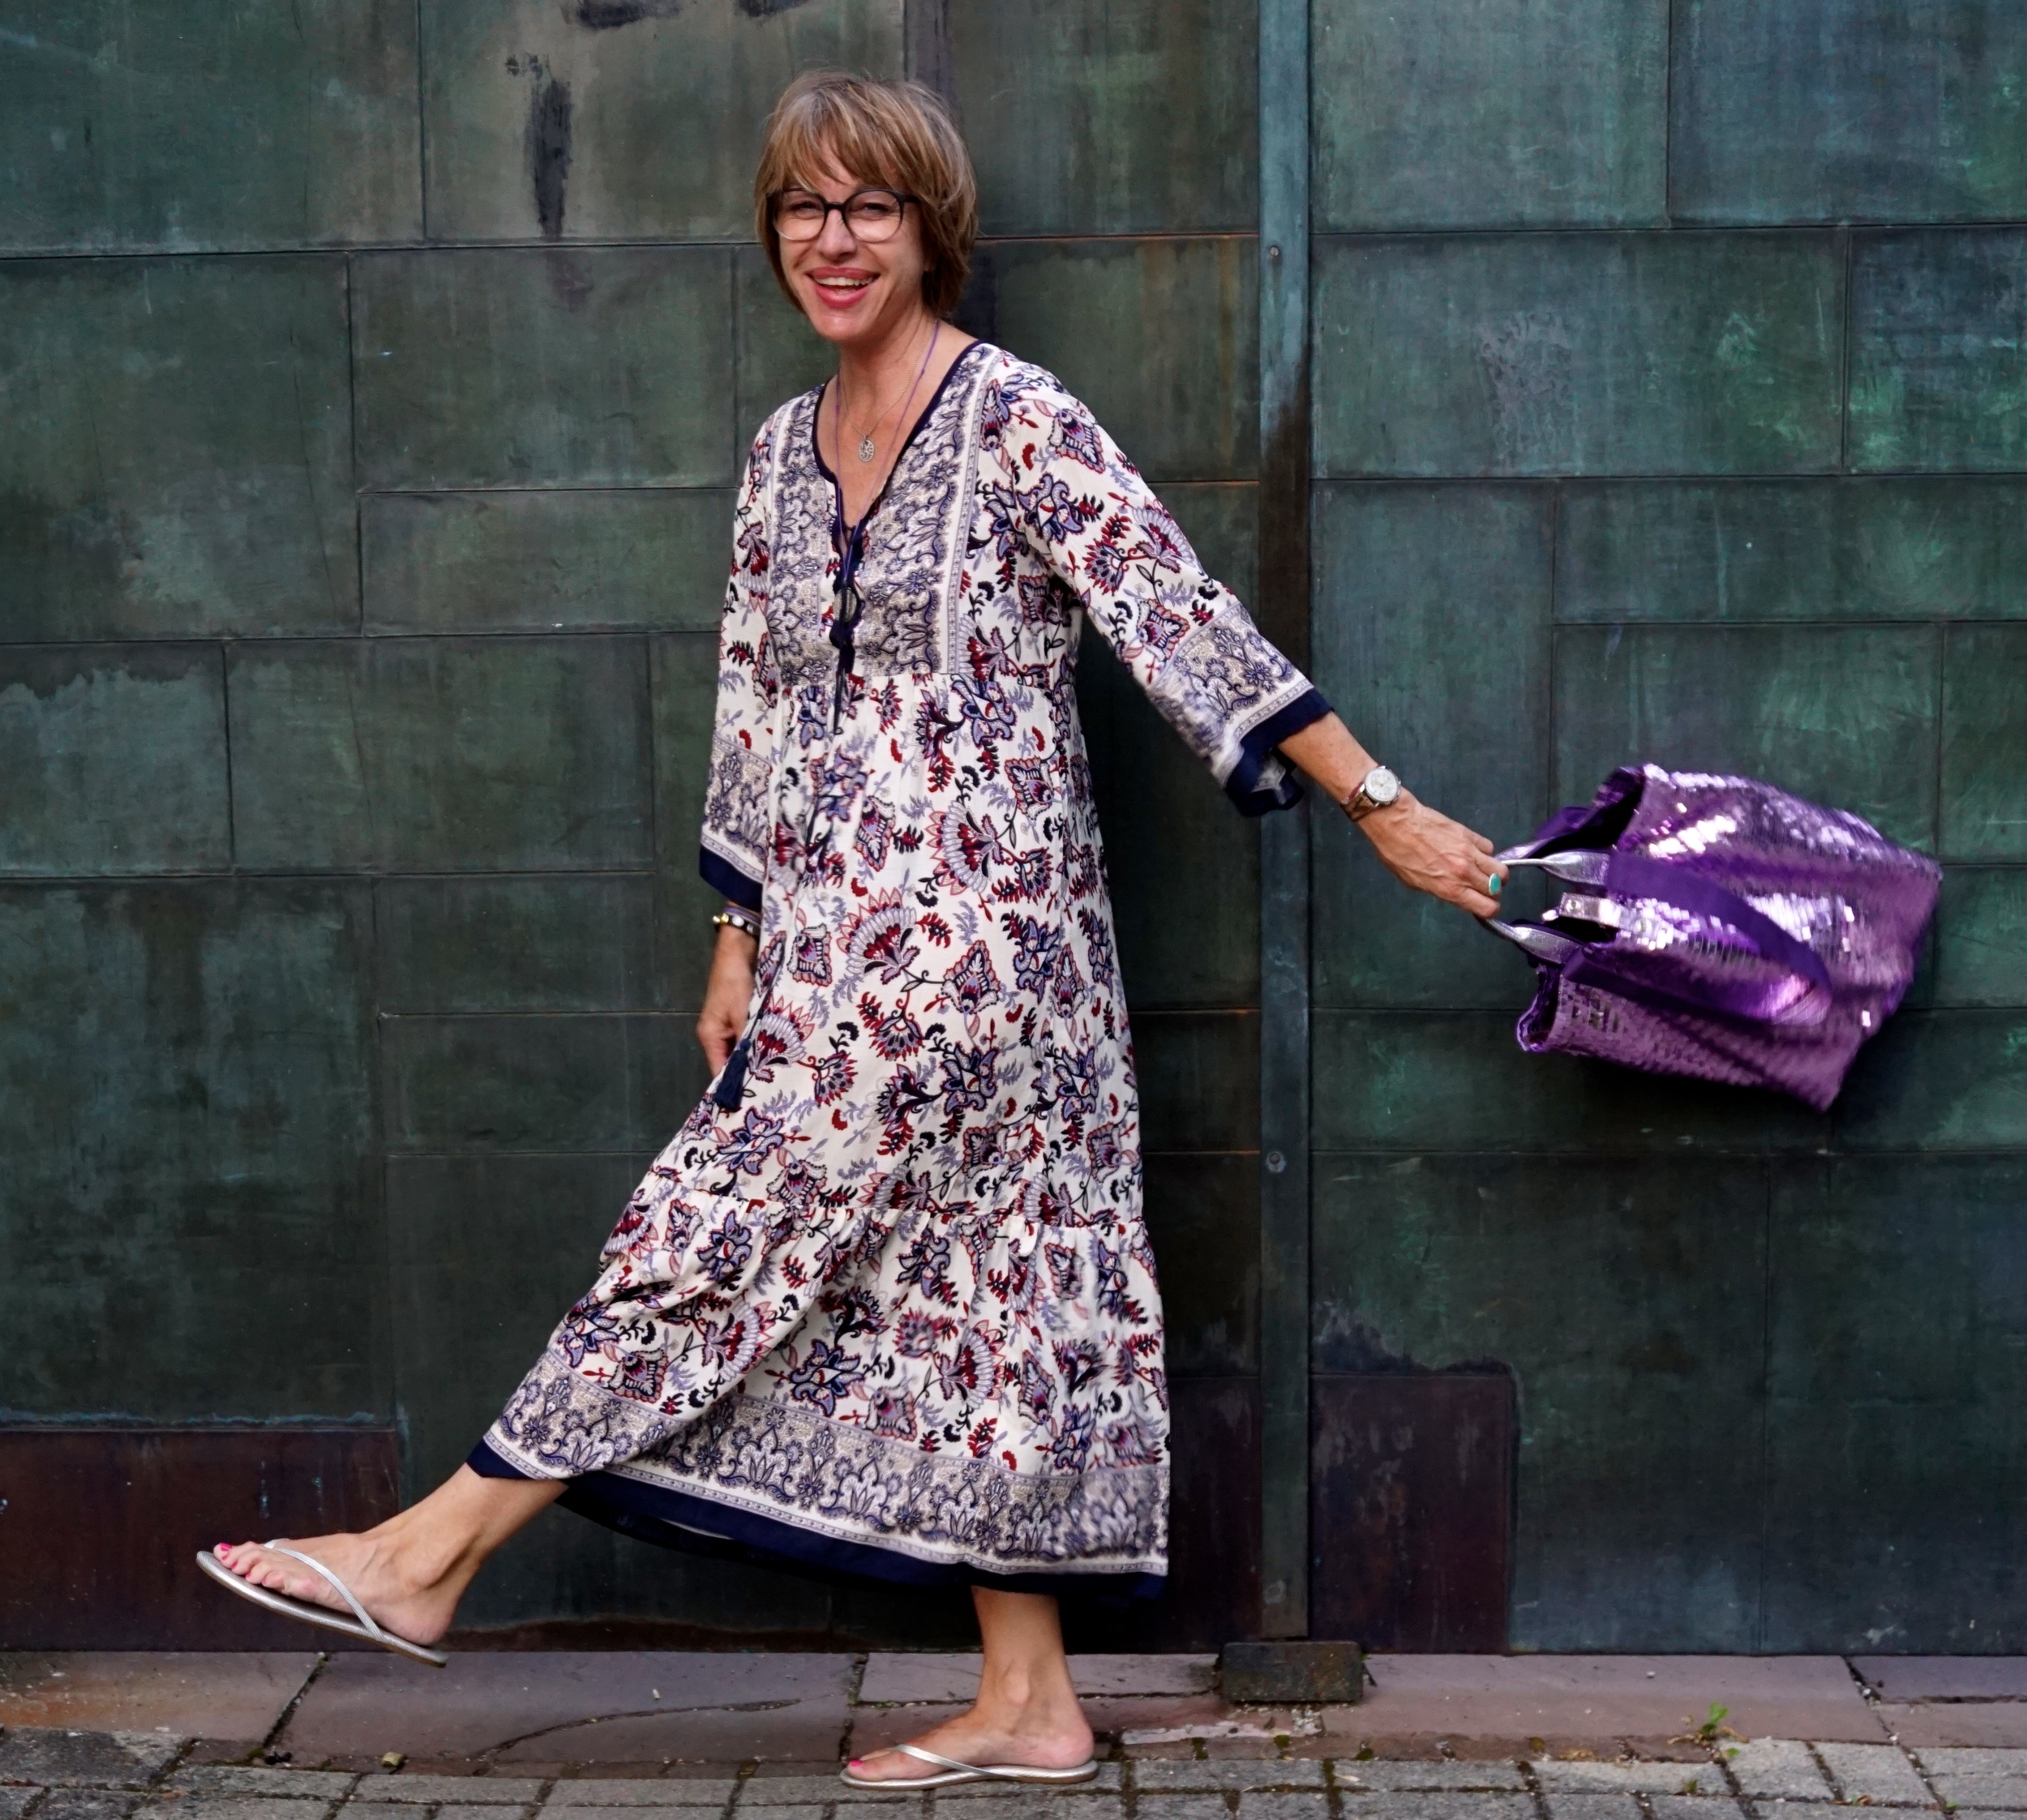 Kleid: Markt Ibiza, Tasche: Brasi & Brasi, Schuhe: Tkees